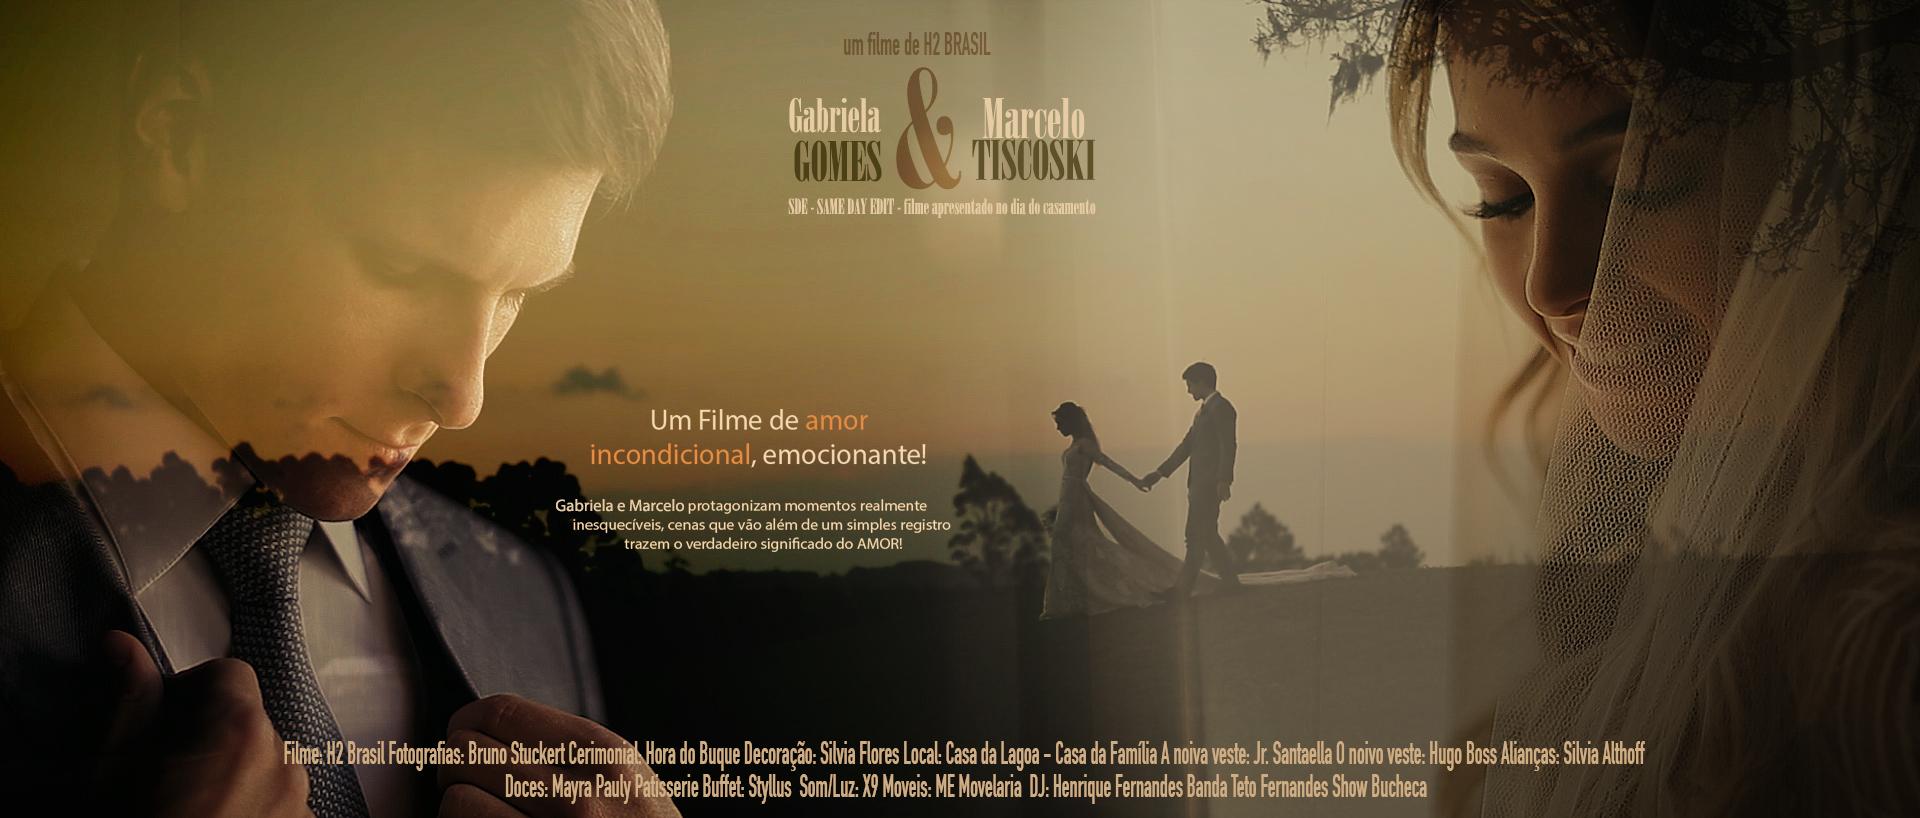 Gabriela-e-Marcelo-banner